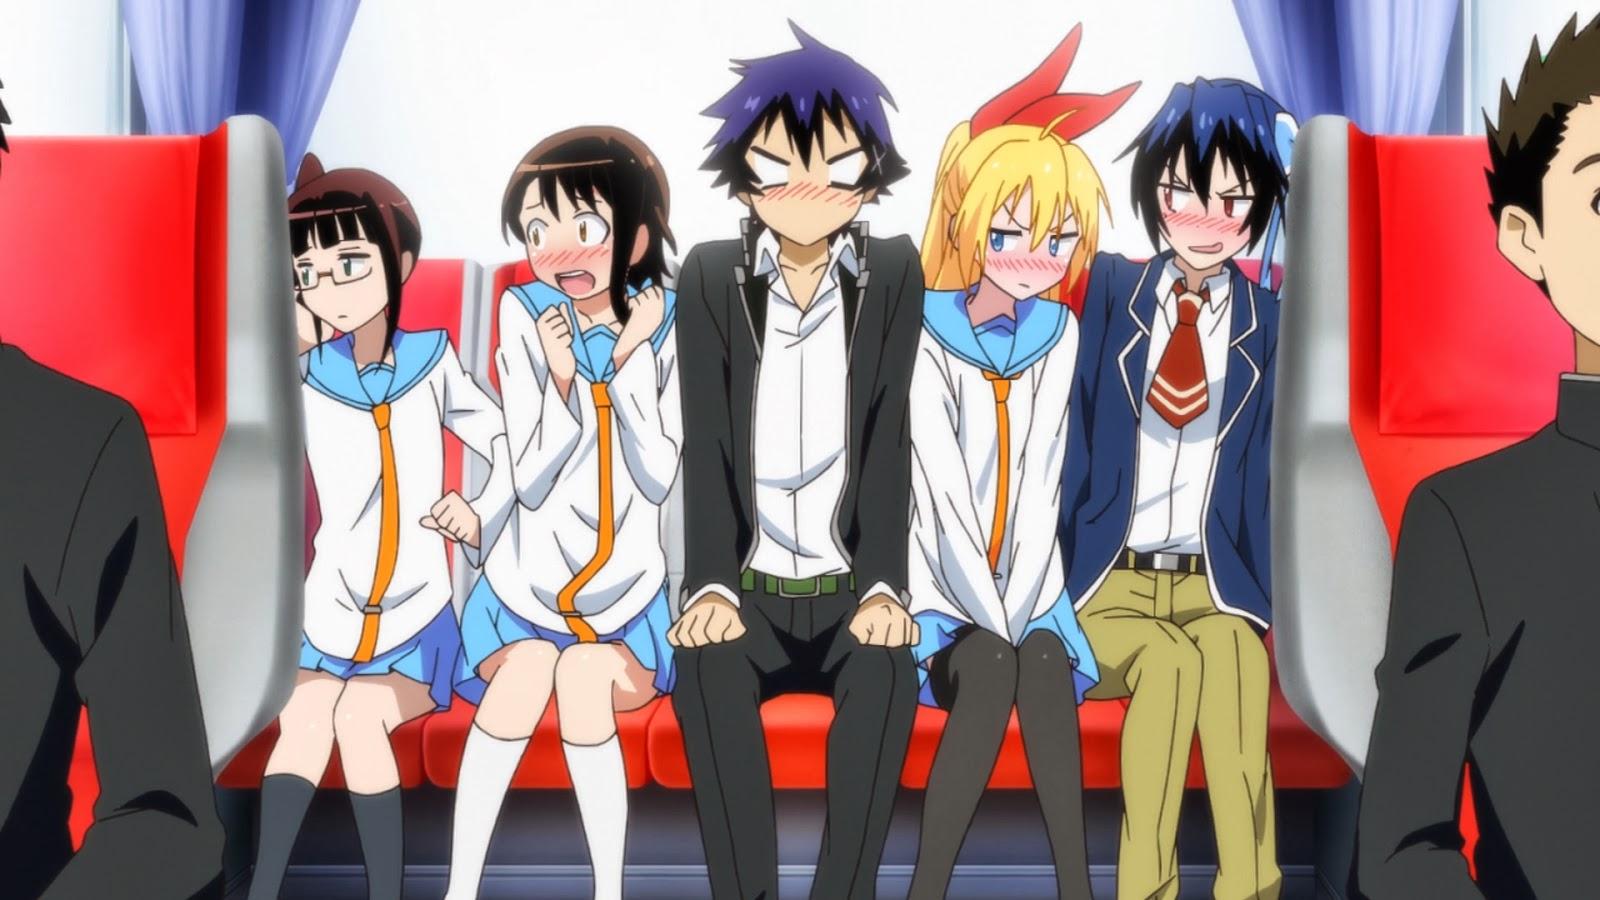 Rekomendasi Anime Romance Terbaik - WibuLand